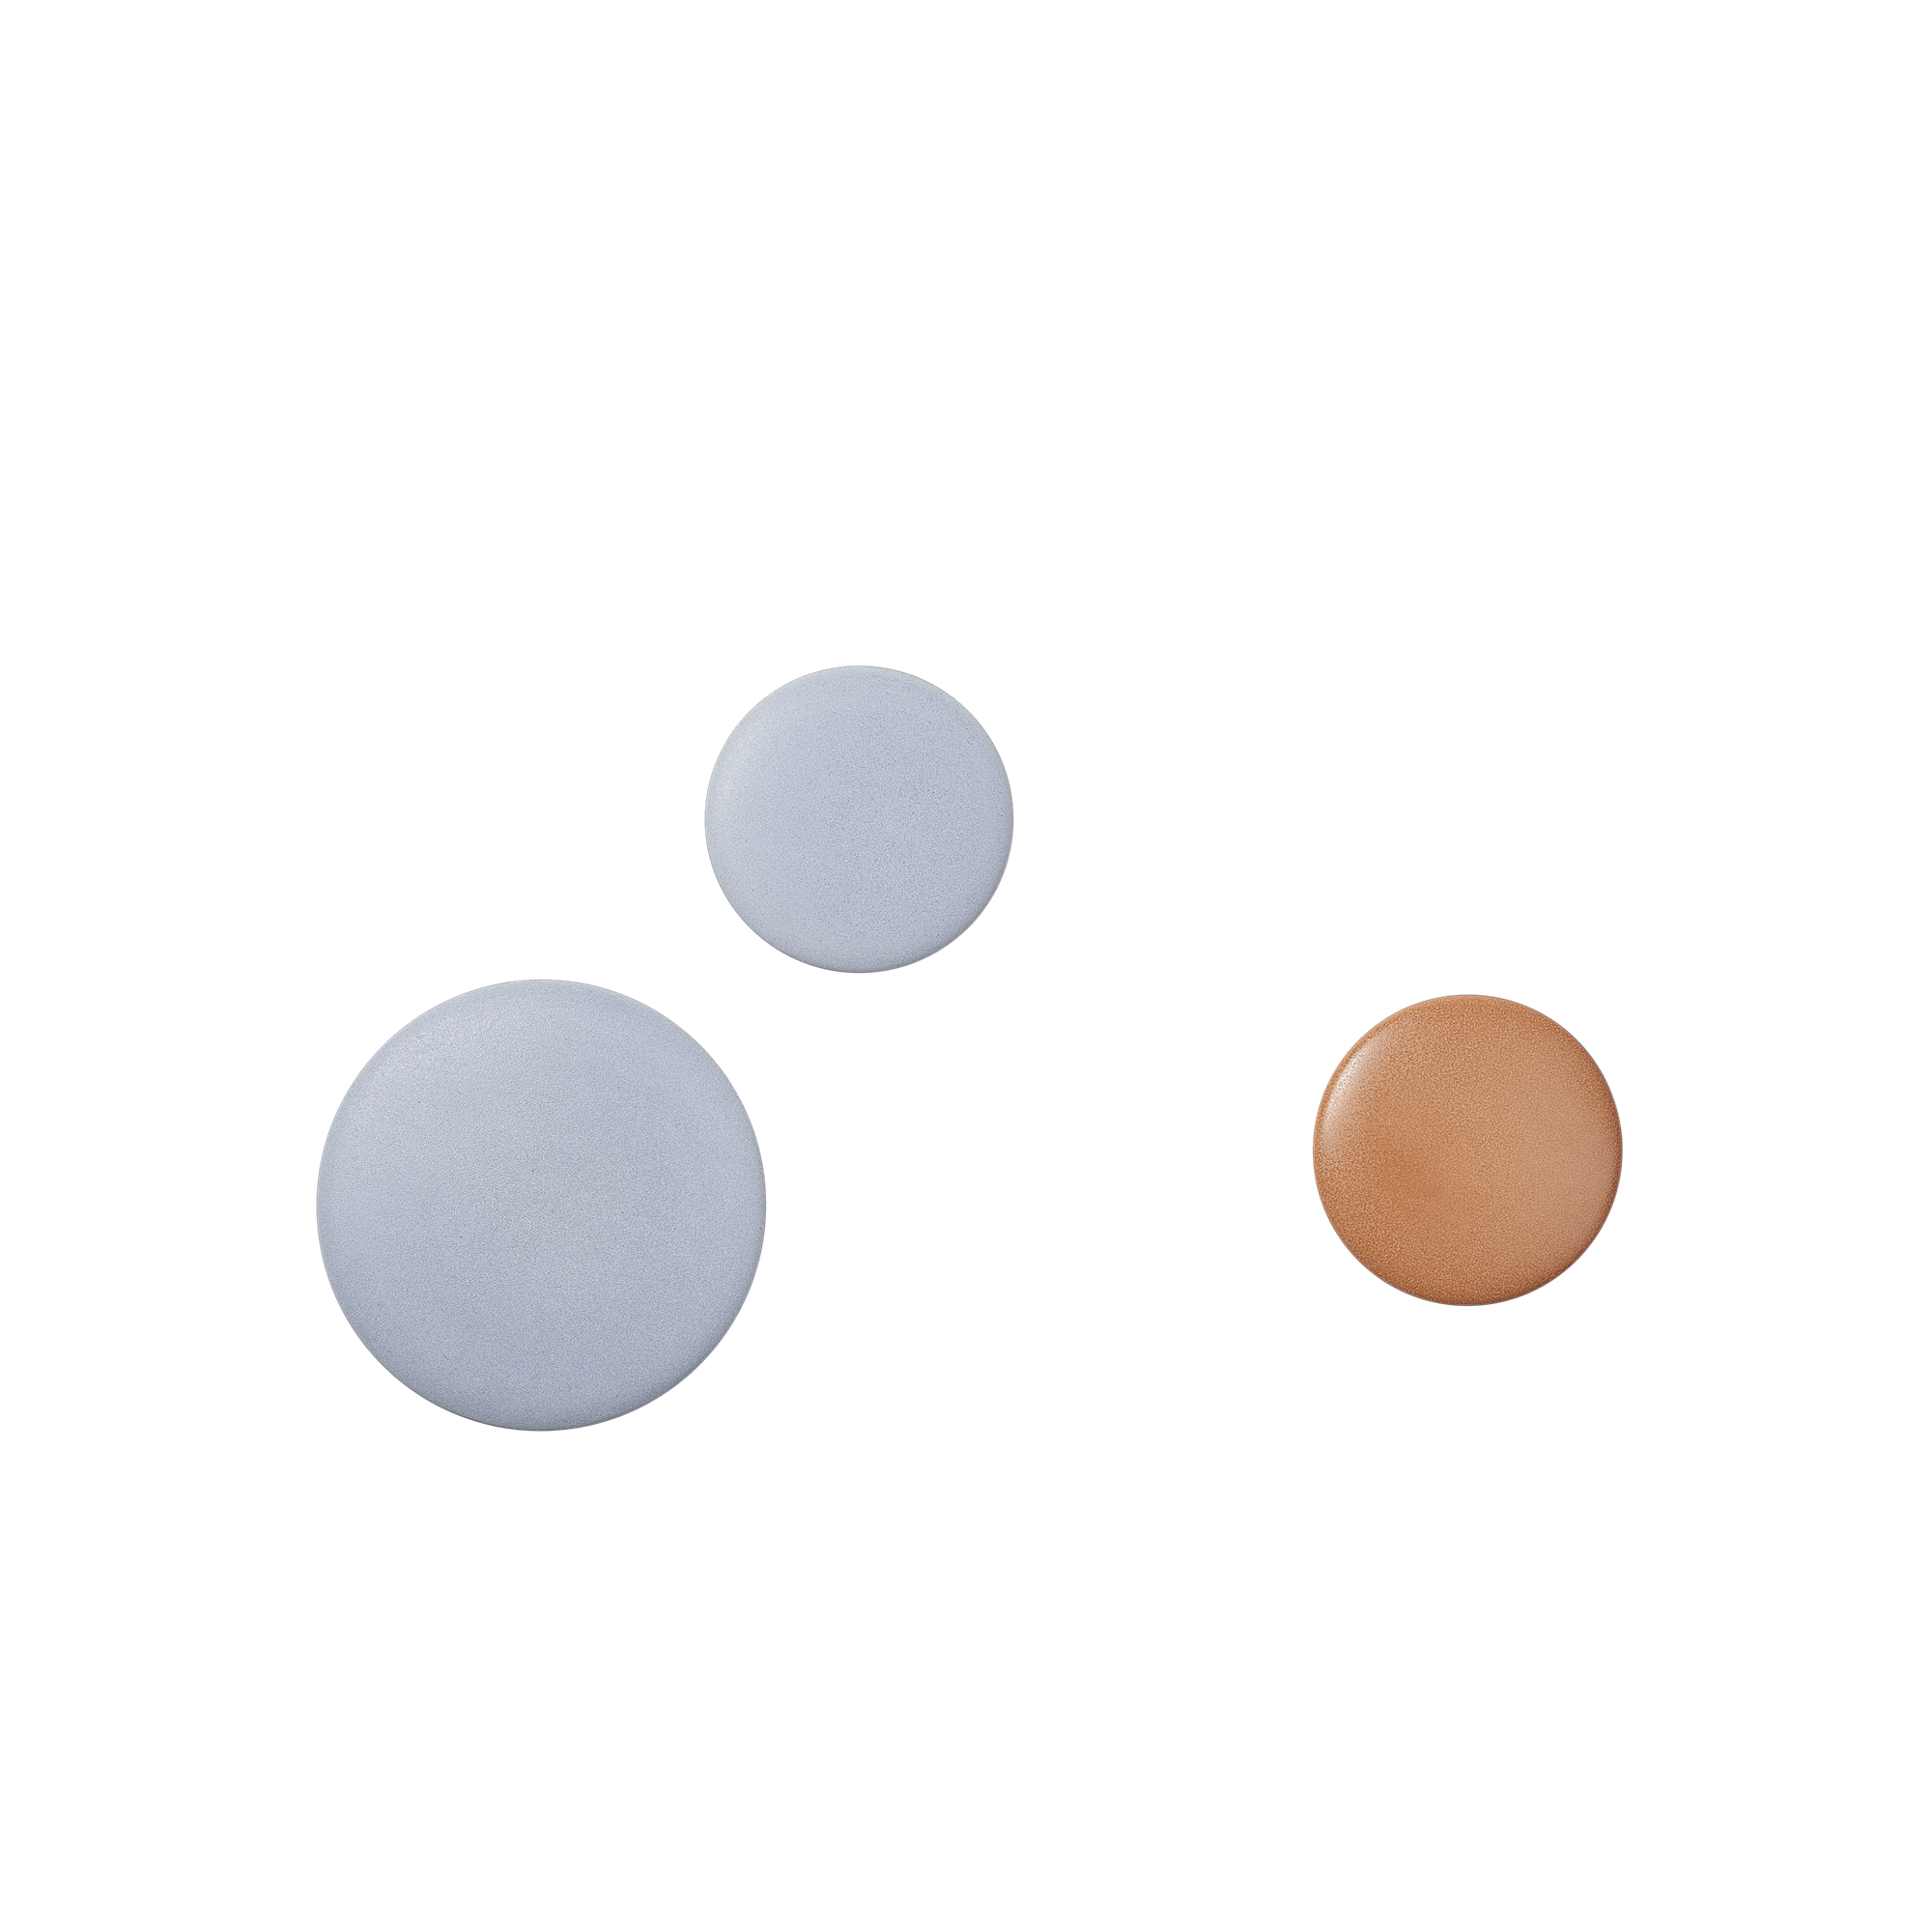 dots-ceramic-master-dots-ceramic-1567074452-351286896